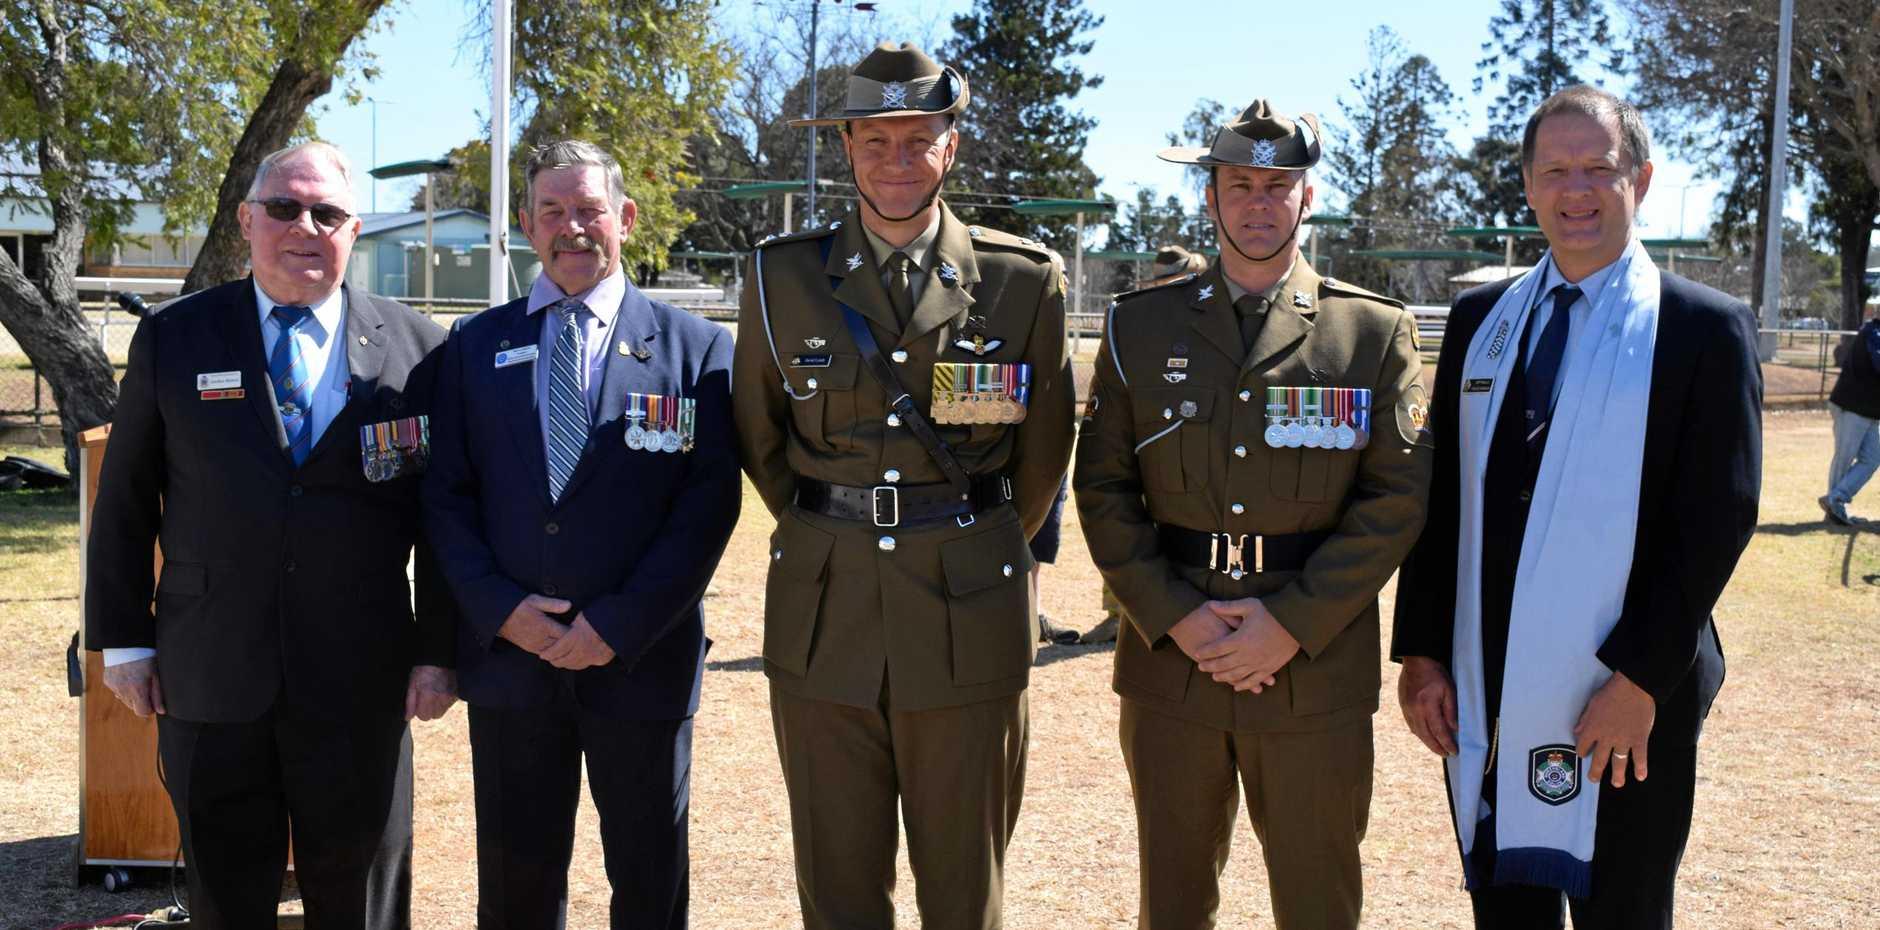 A DAY OF RESPECTS: Gordon Nielson, Ken Ashton, LTCOL David Lynch, WO2 Tim Thompson and Jeff Baills. Spoke at today's Vietnam Veteran's rememberance service.